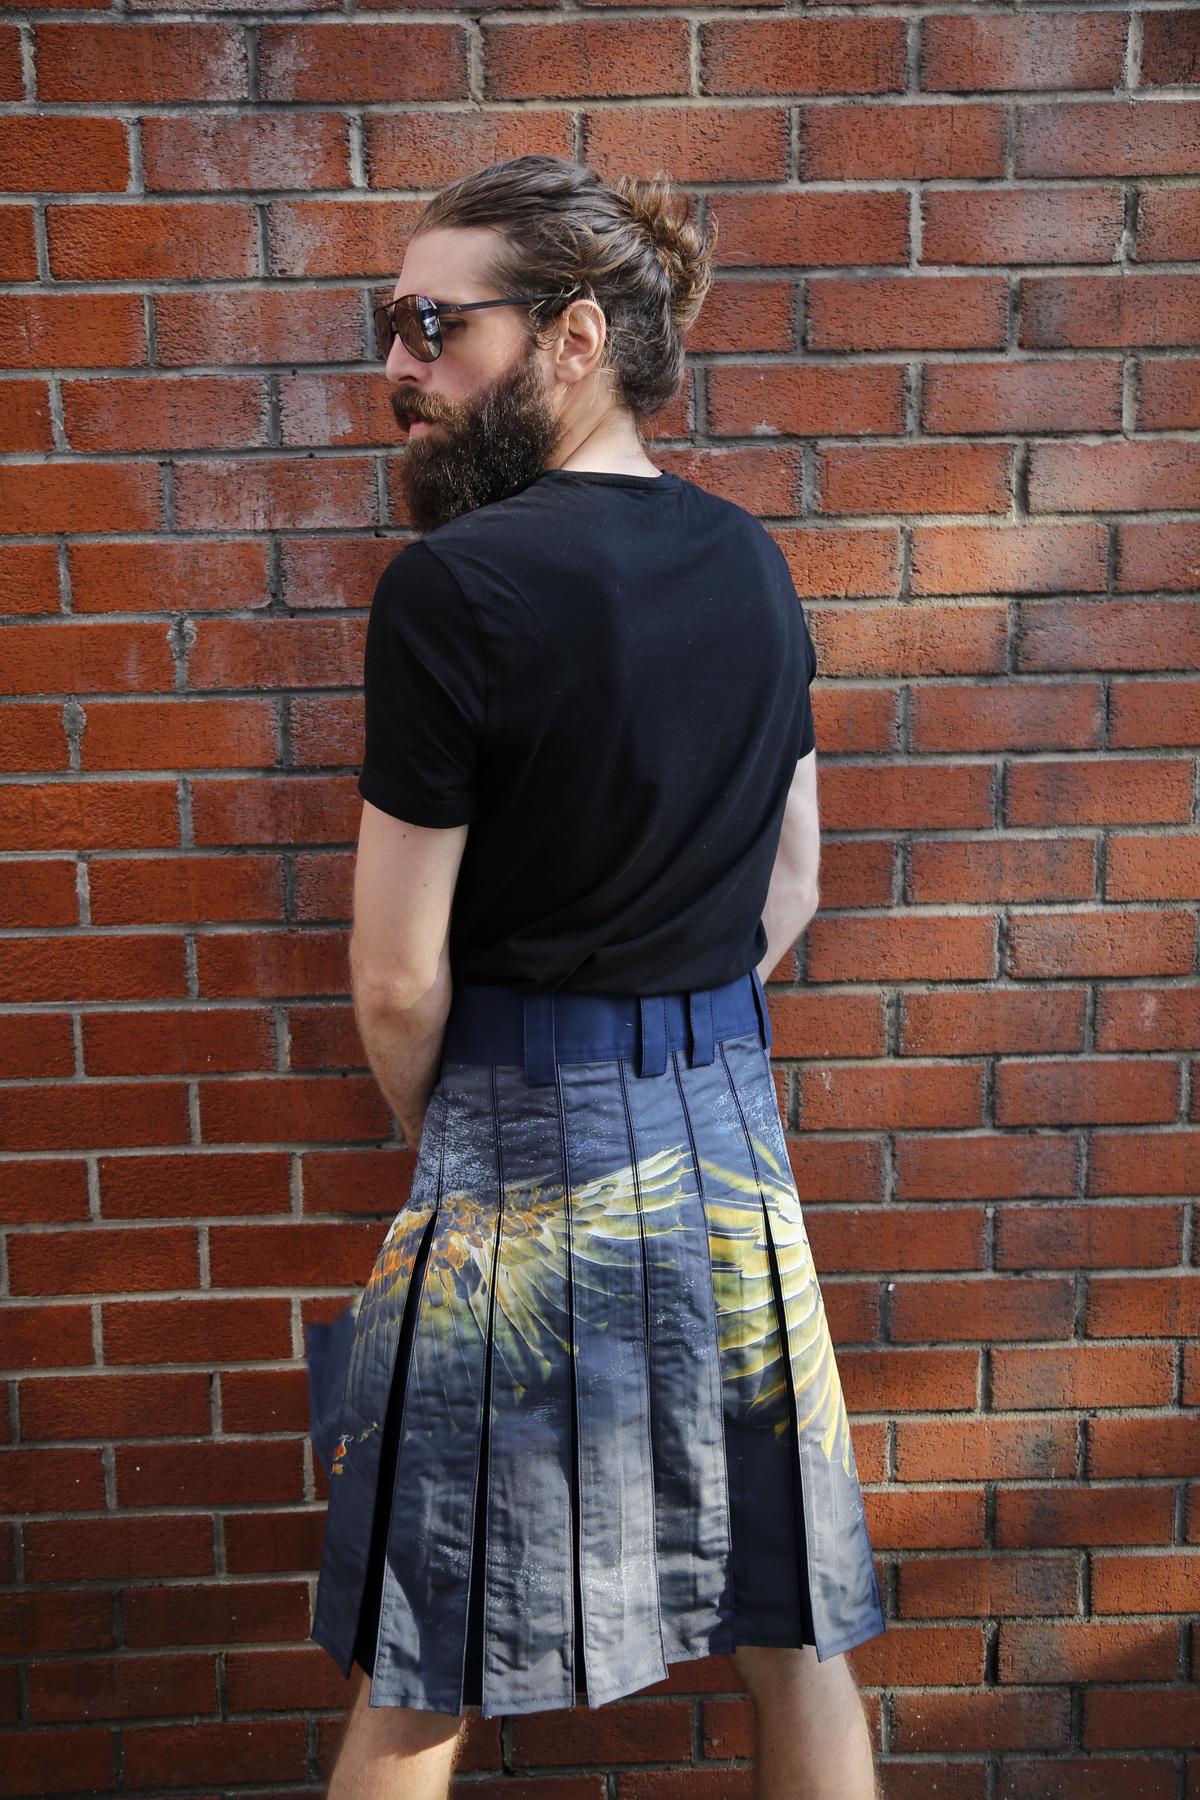 Printed Kilt for Fashionable Men-back